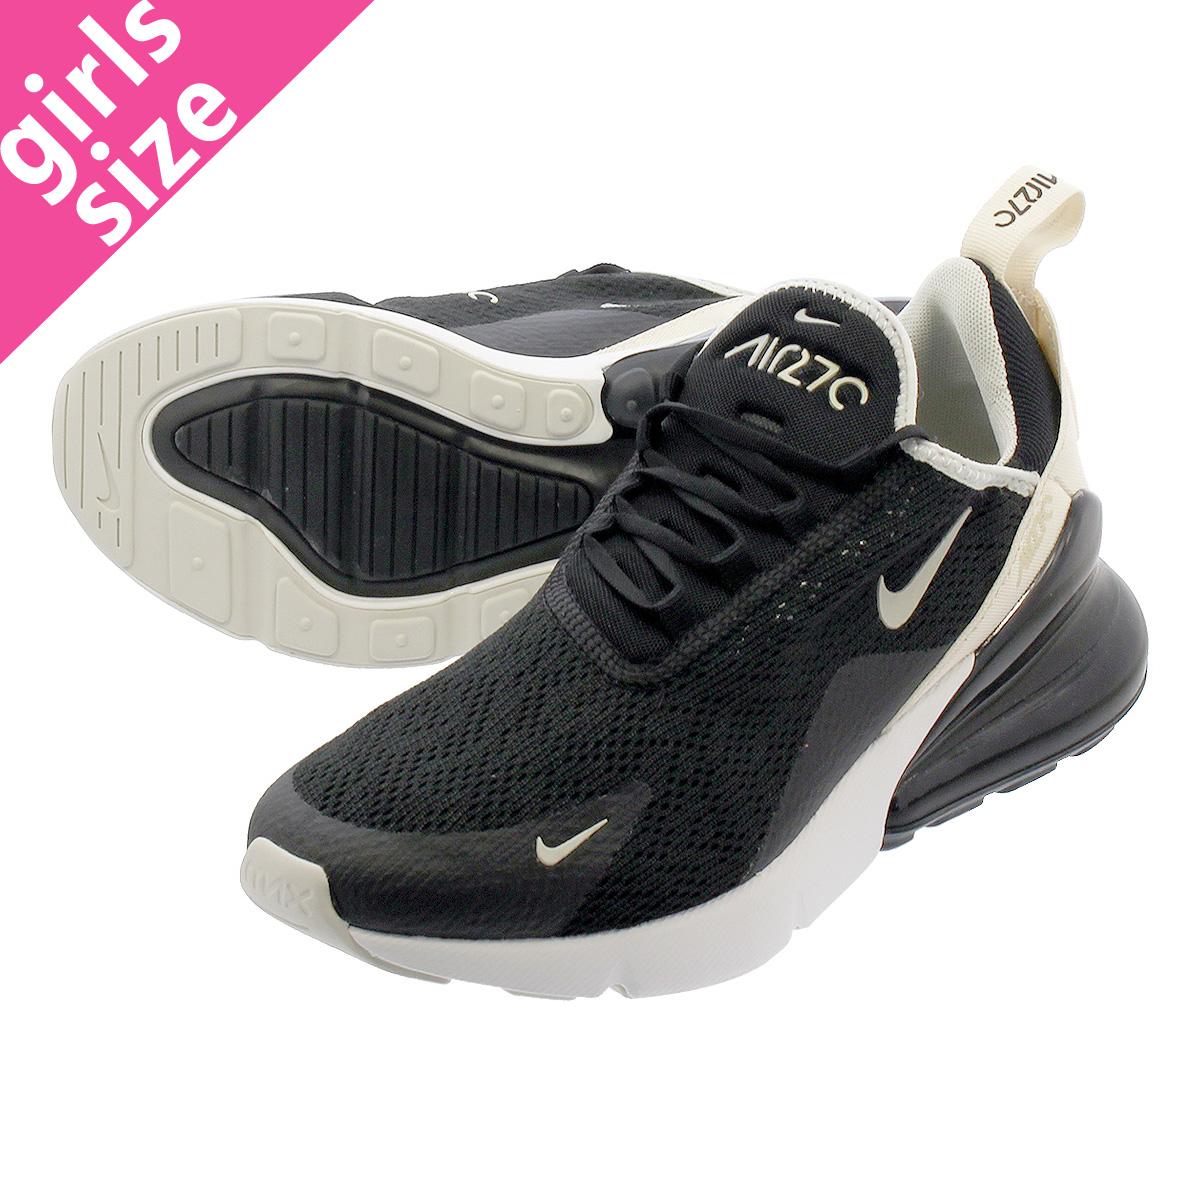 Nike WMNS Air Max 270 black light light bone (AH6789 010)